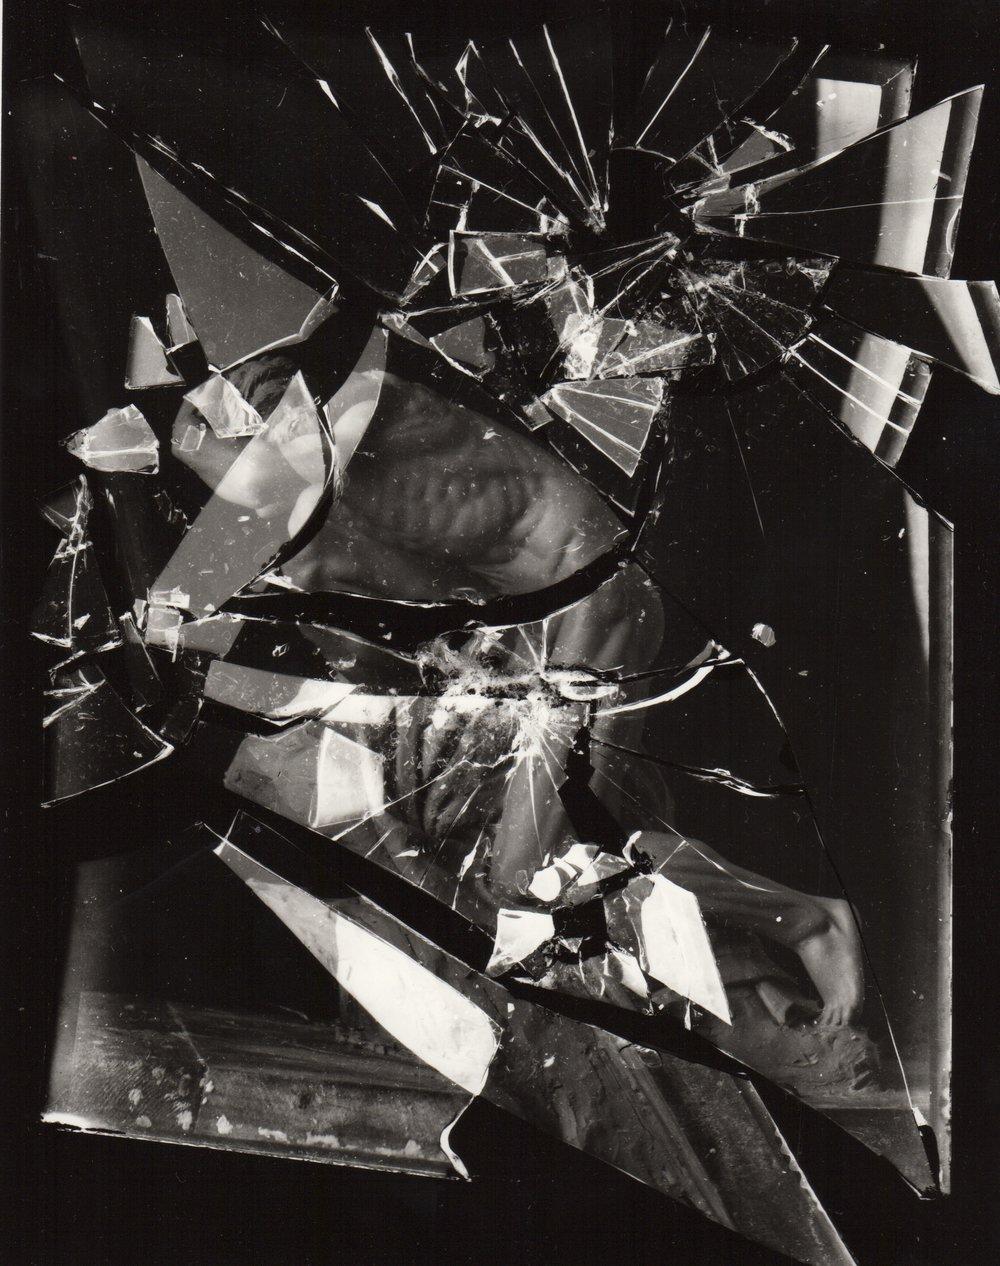 "Randy Grskovic,  Memory 1 (v.3),  selenium toned gelatin silver print, 18"" x 20"" 2016"